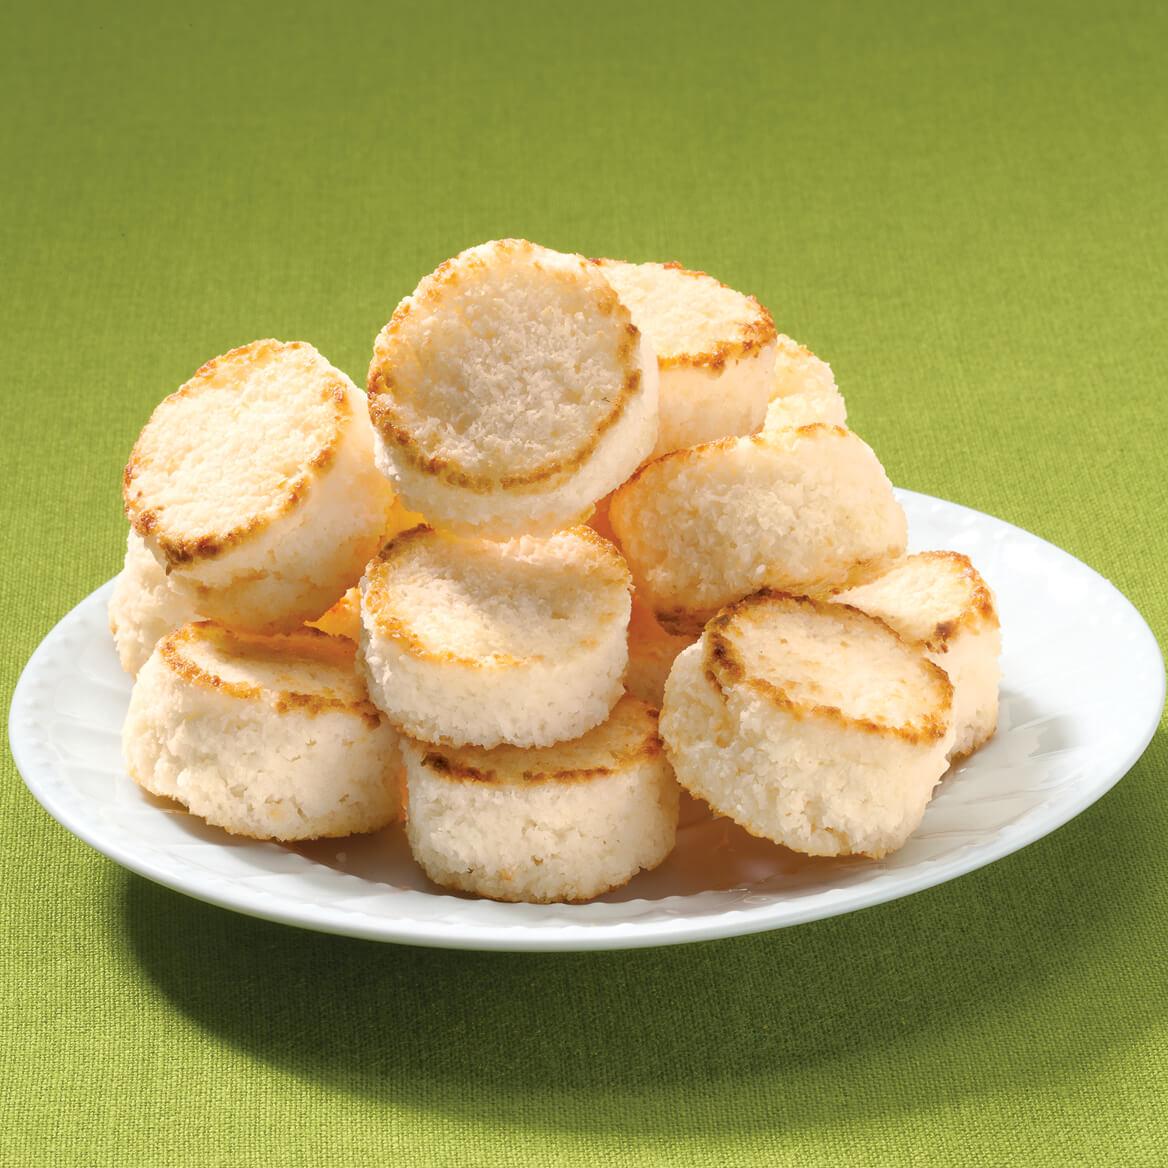 Toasted Macaroons 13 oz-349887